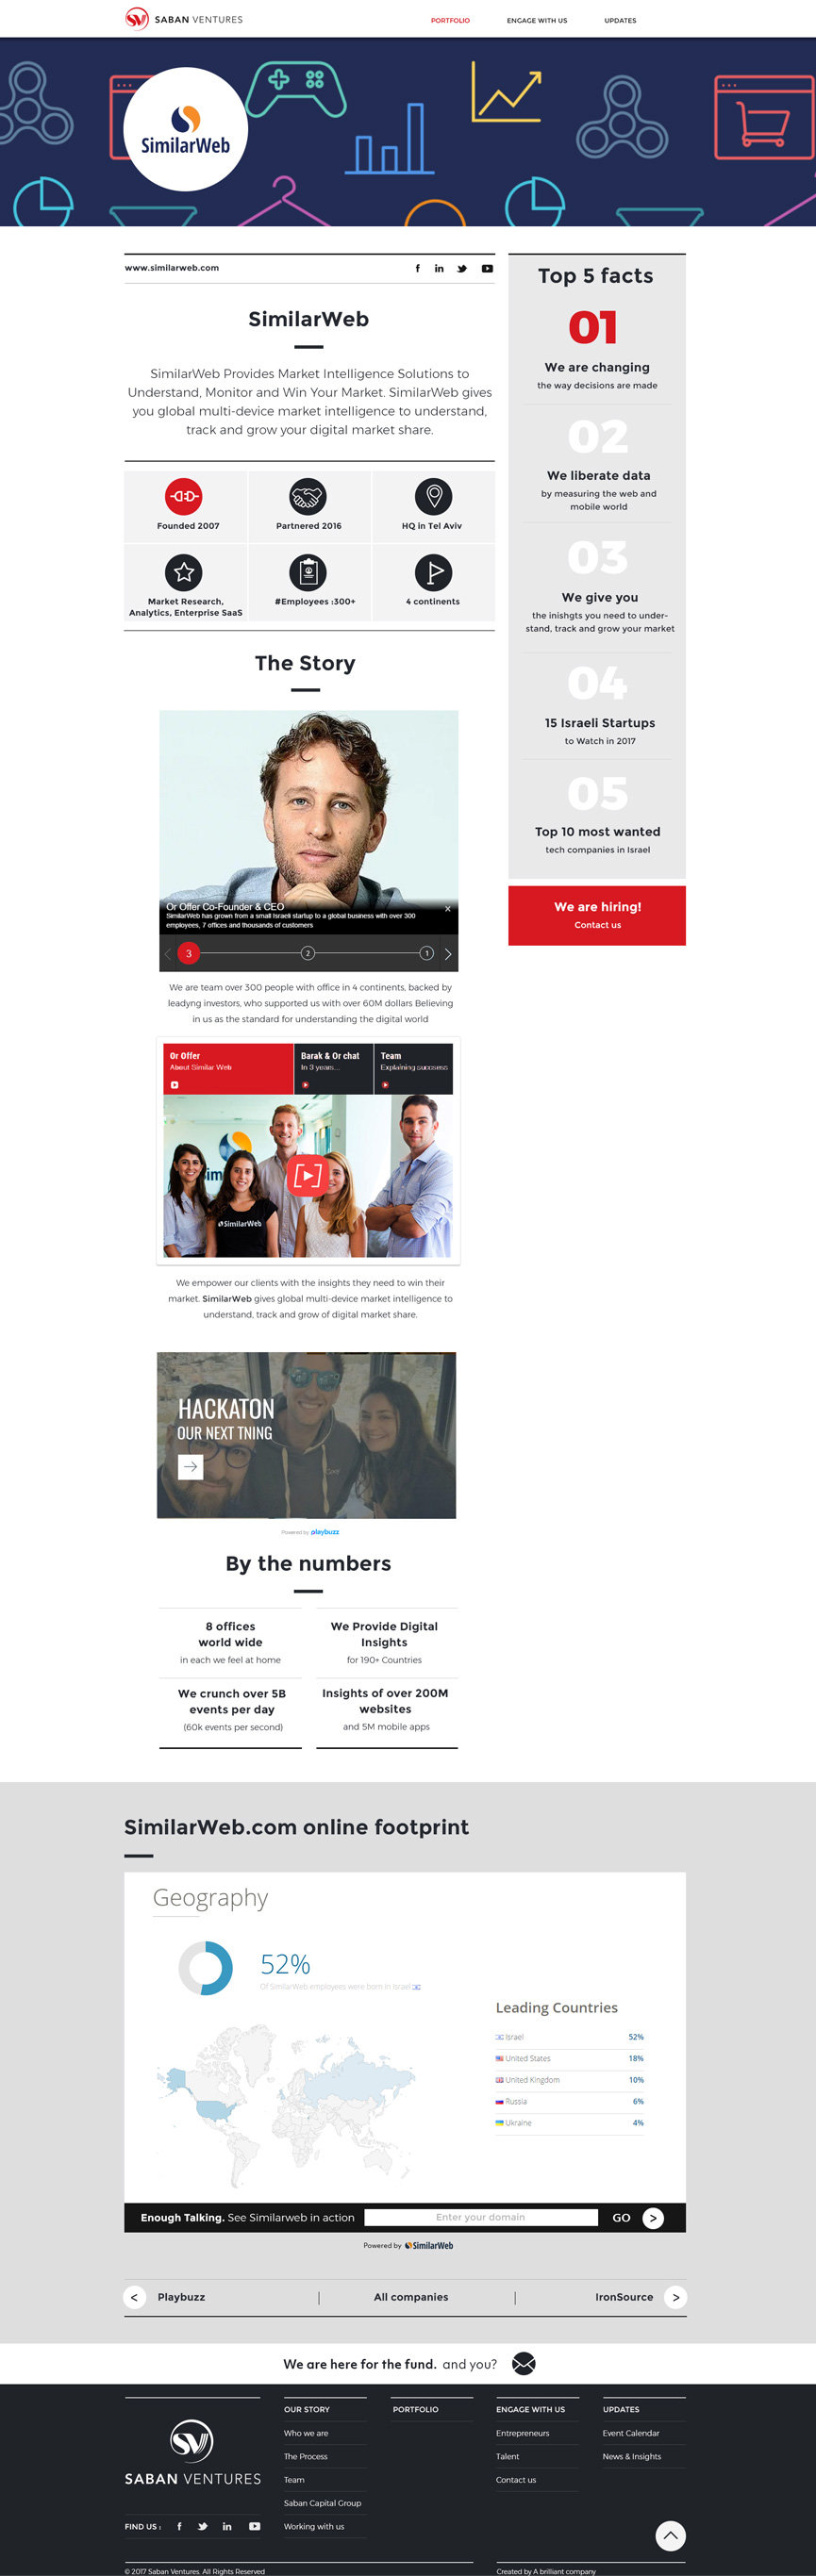 company's page